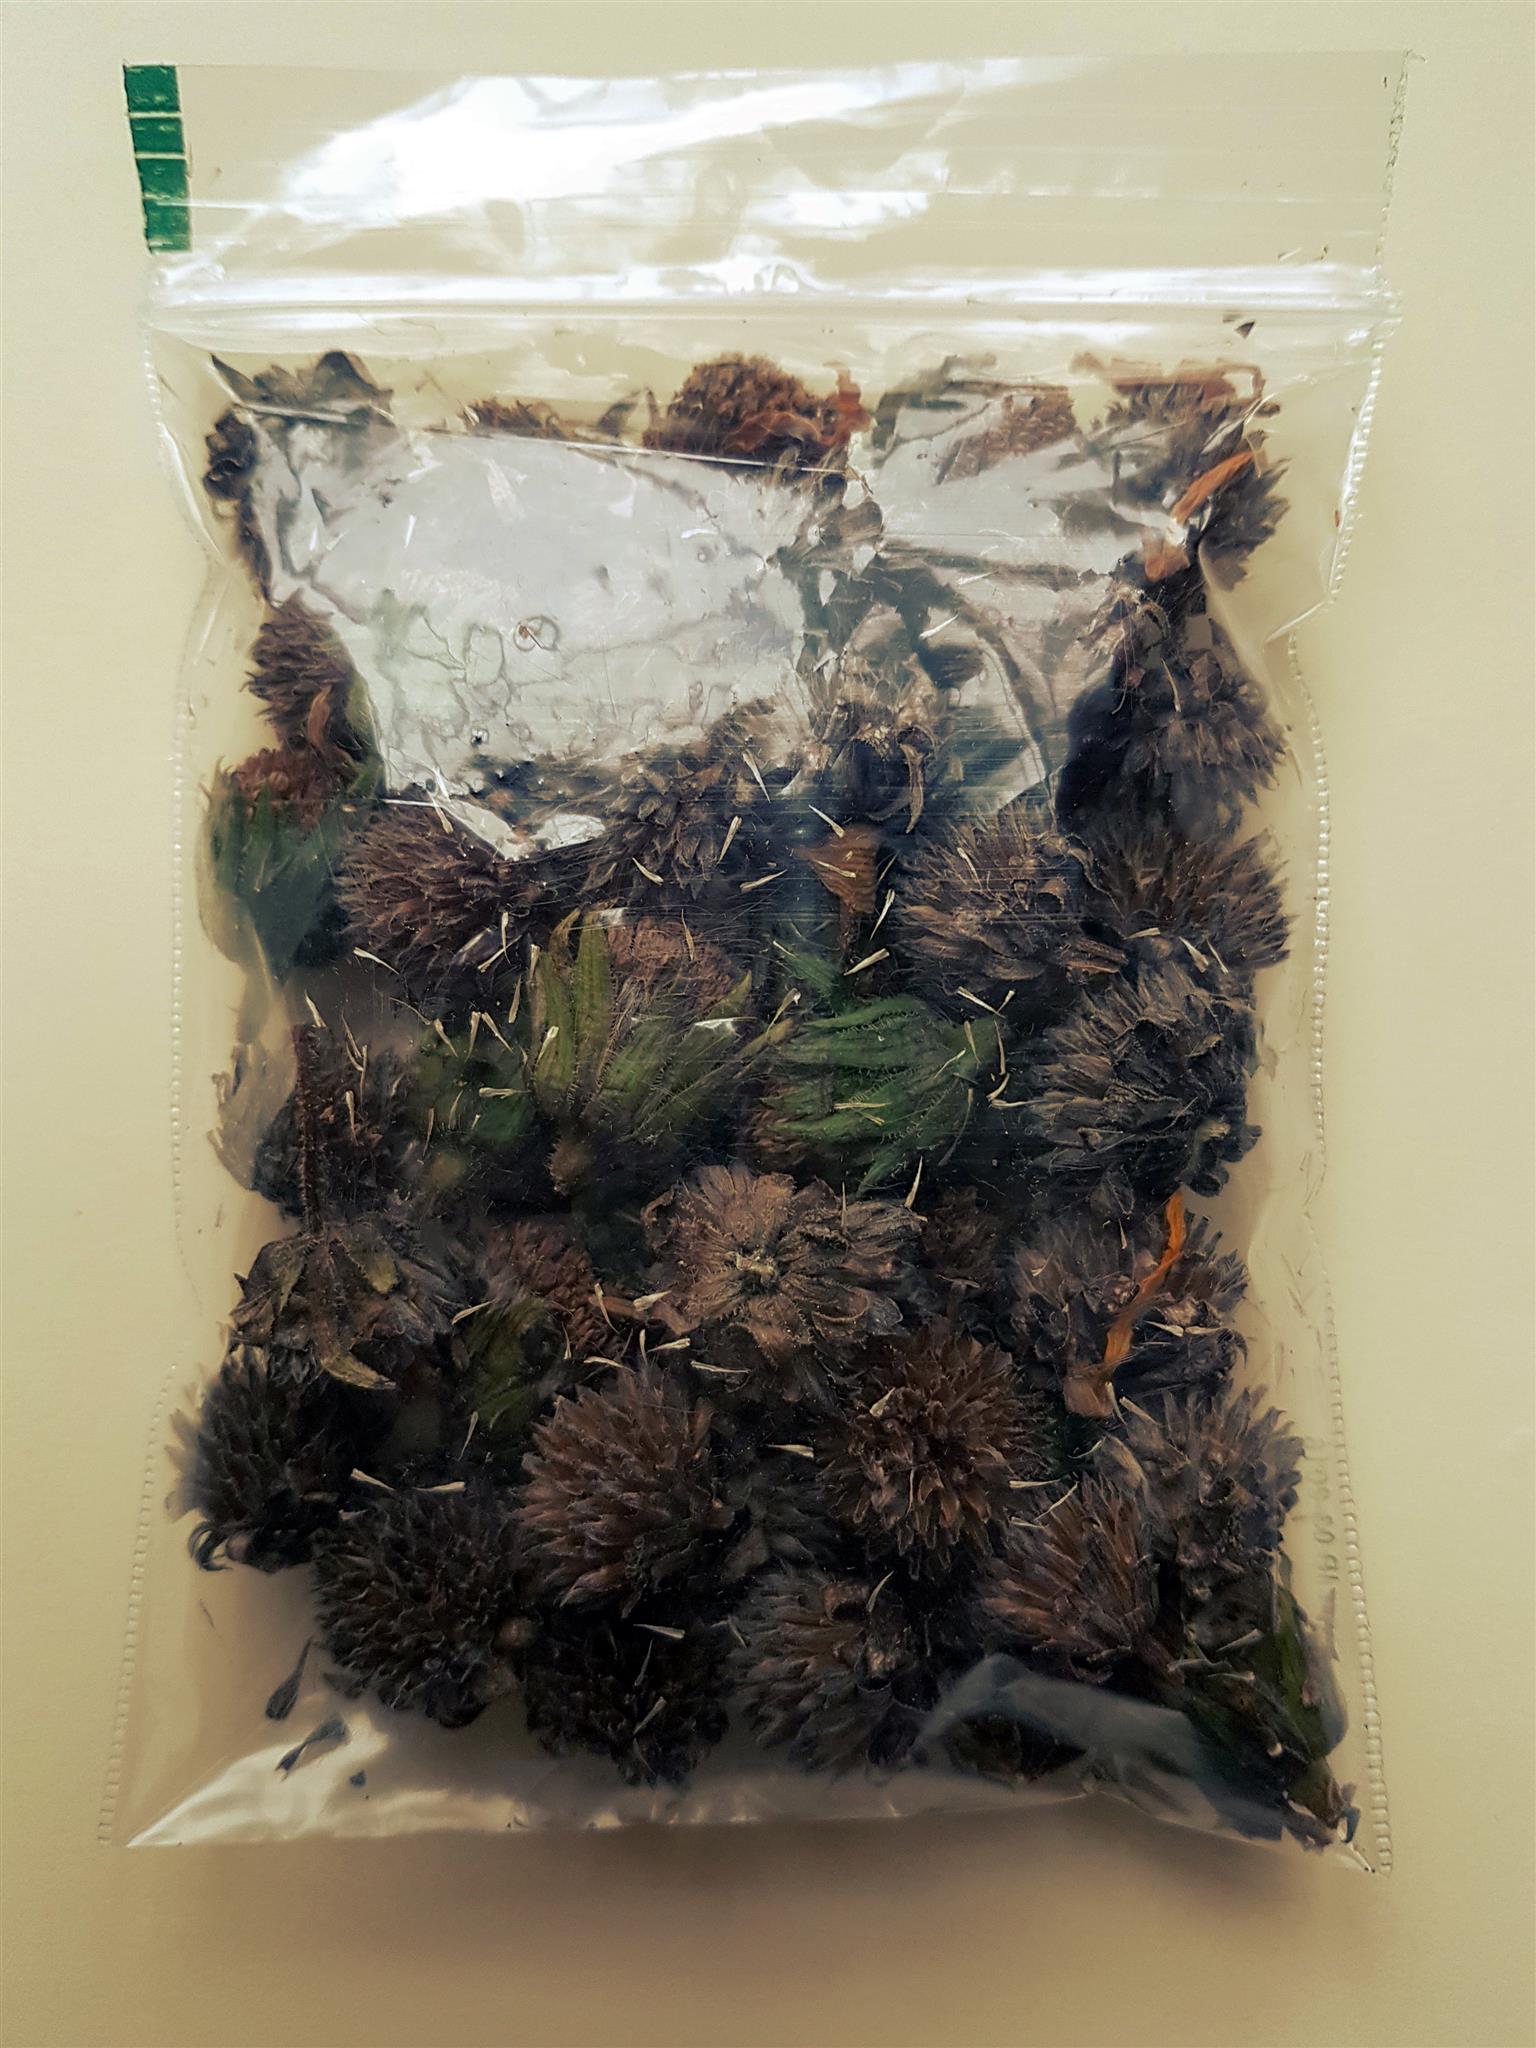 Jerusalem Artichoke Seeds